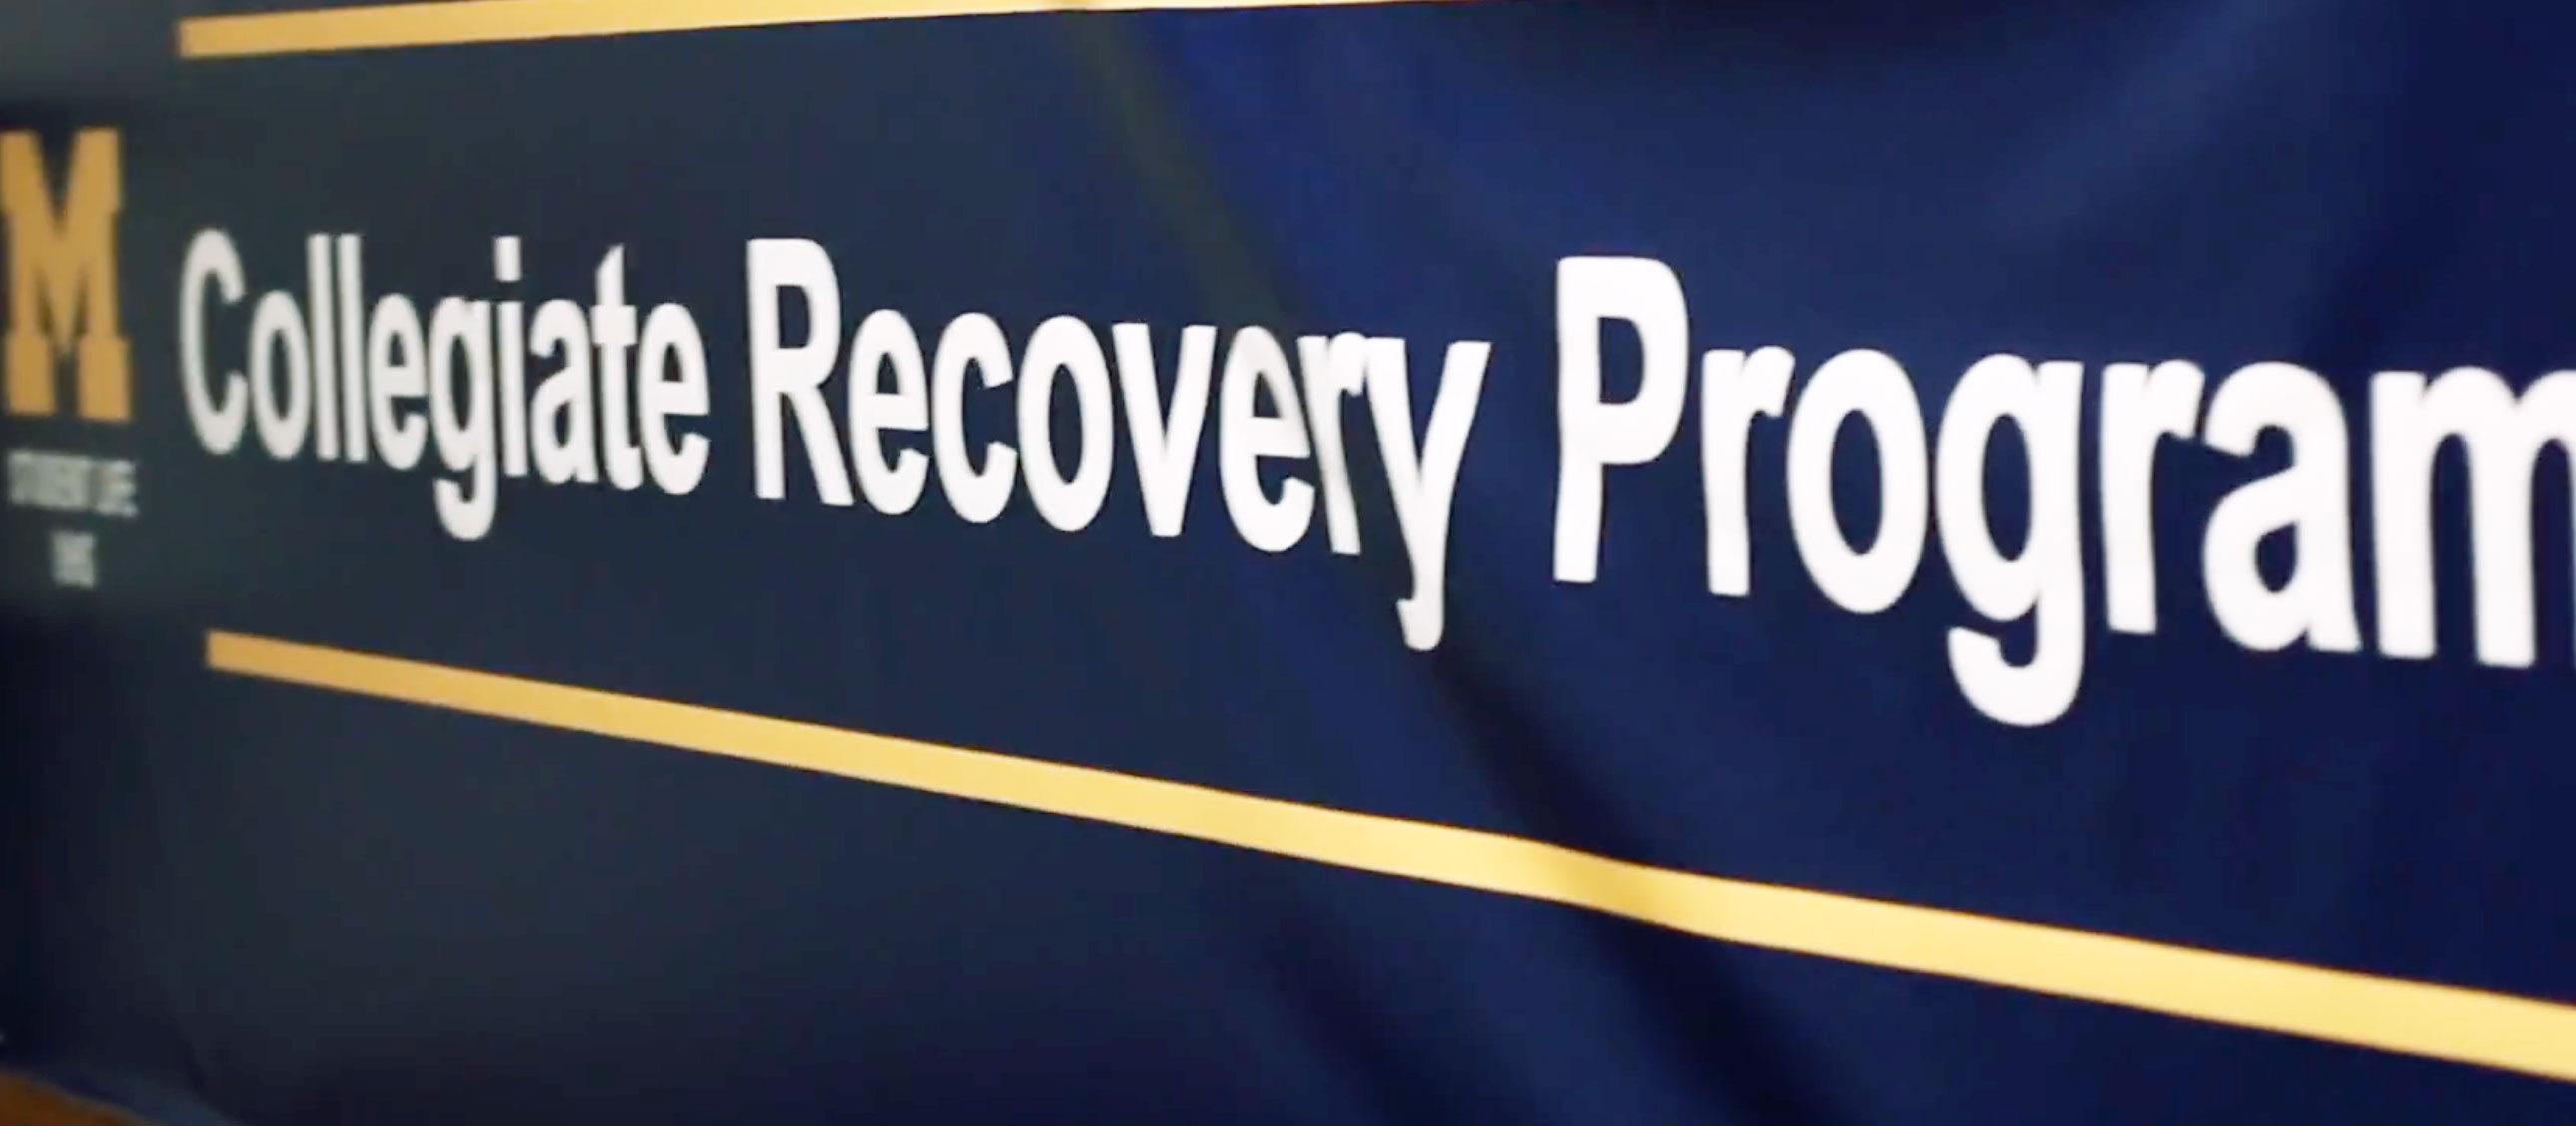 Collegiate Recovery Program banner